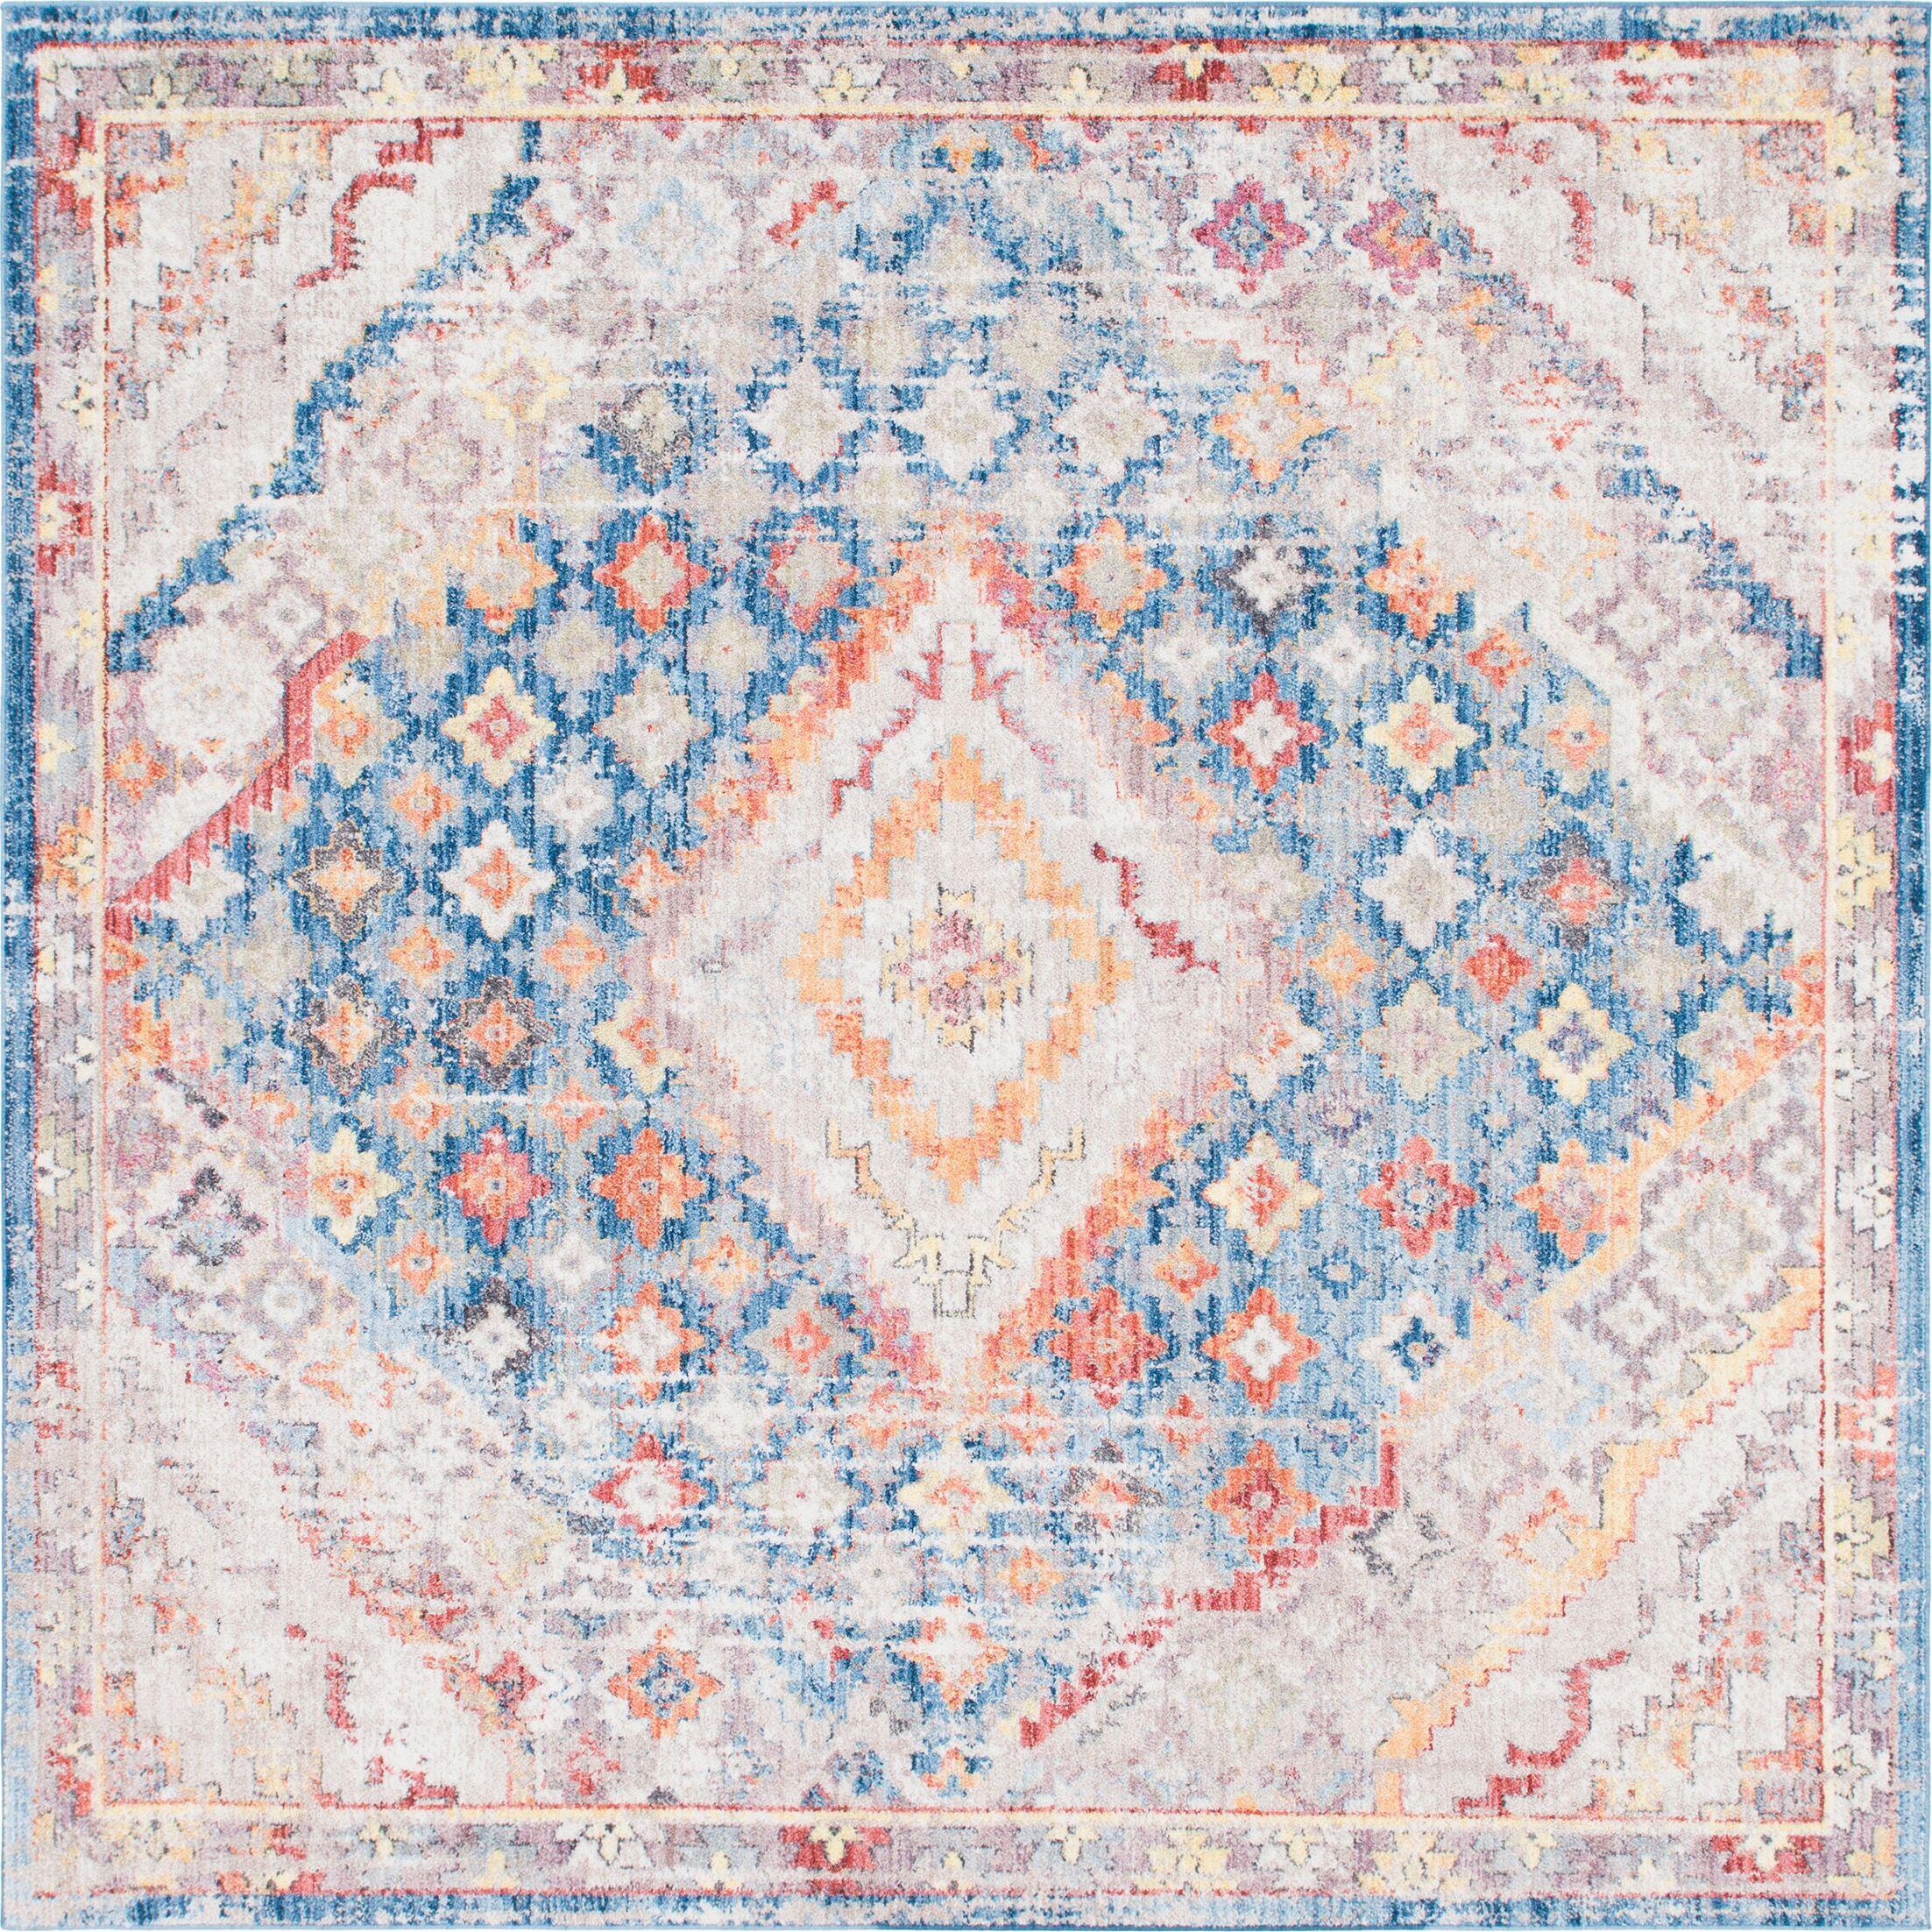 Gomez Blue/Orange Area Rug Rug Size: Square 8'